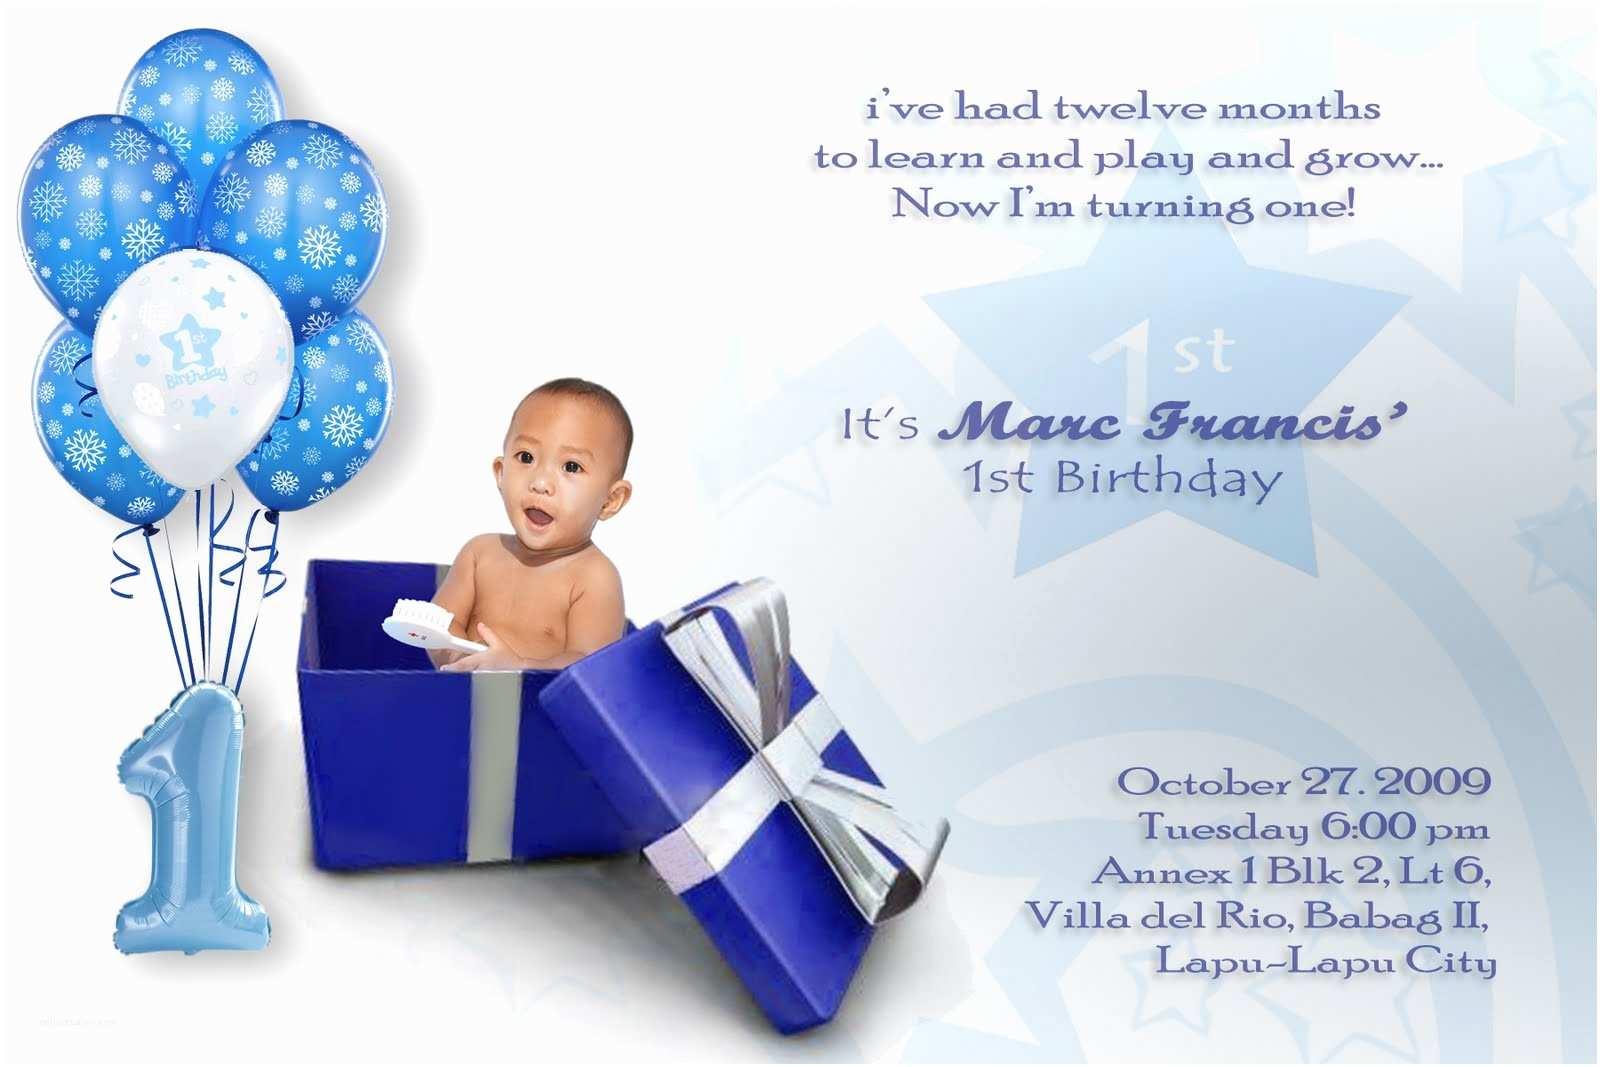 First Birthday Invitations Boy Baby Boy First Birthday Invitations